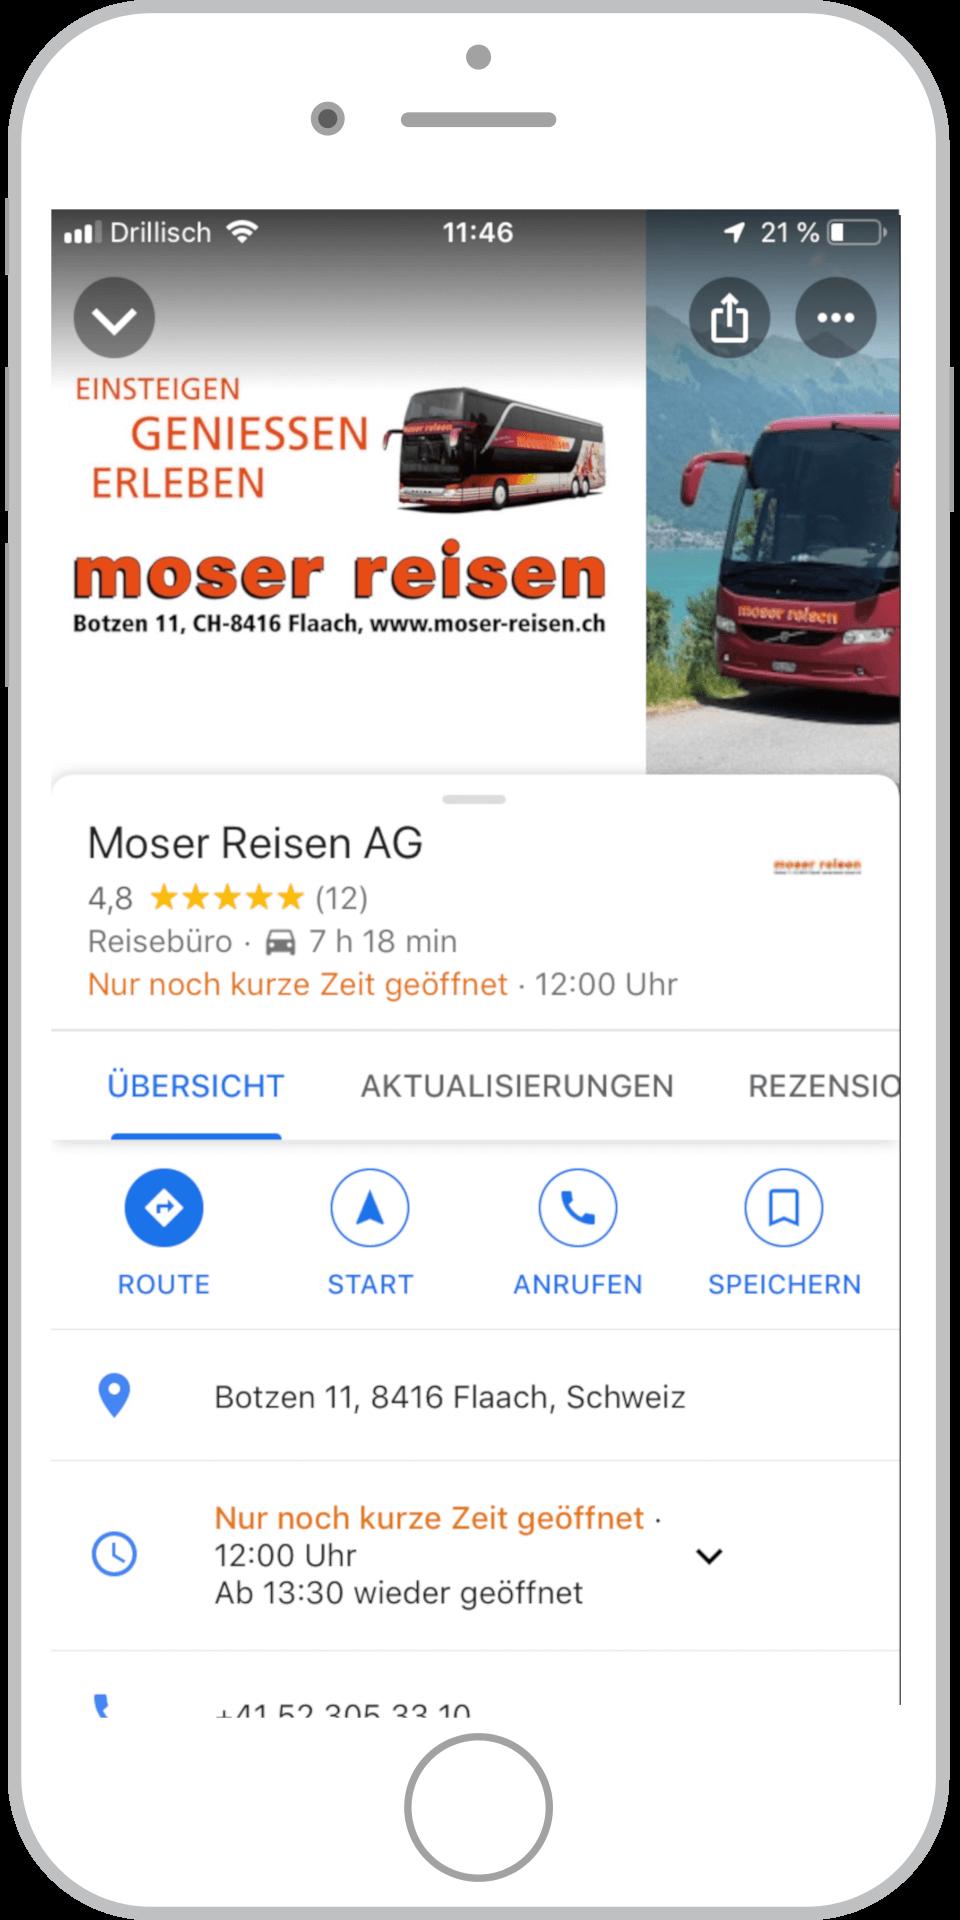 Referenz Moser Reisen Google My Business